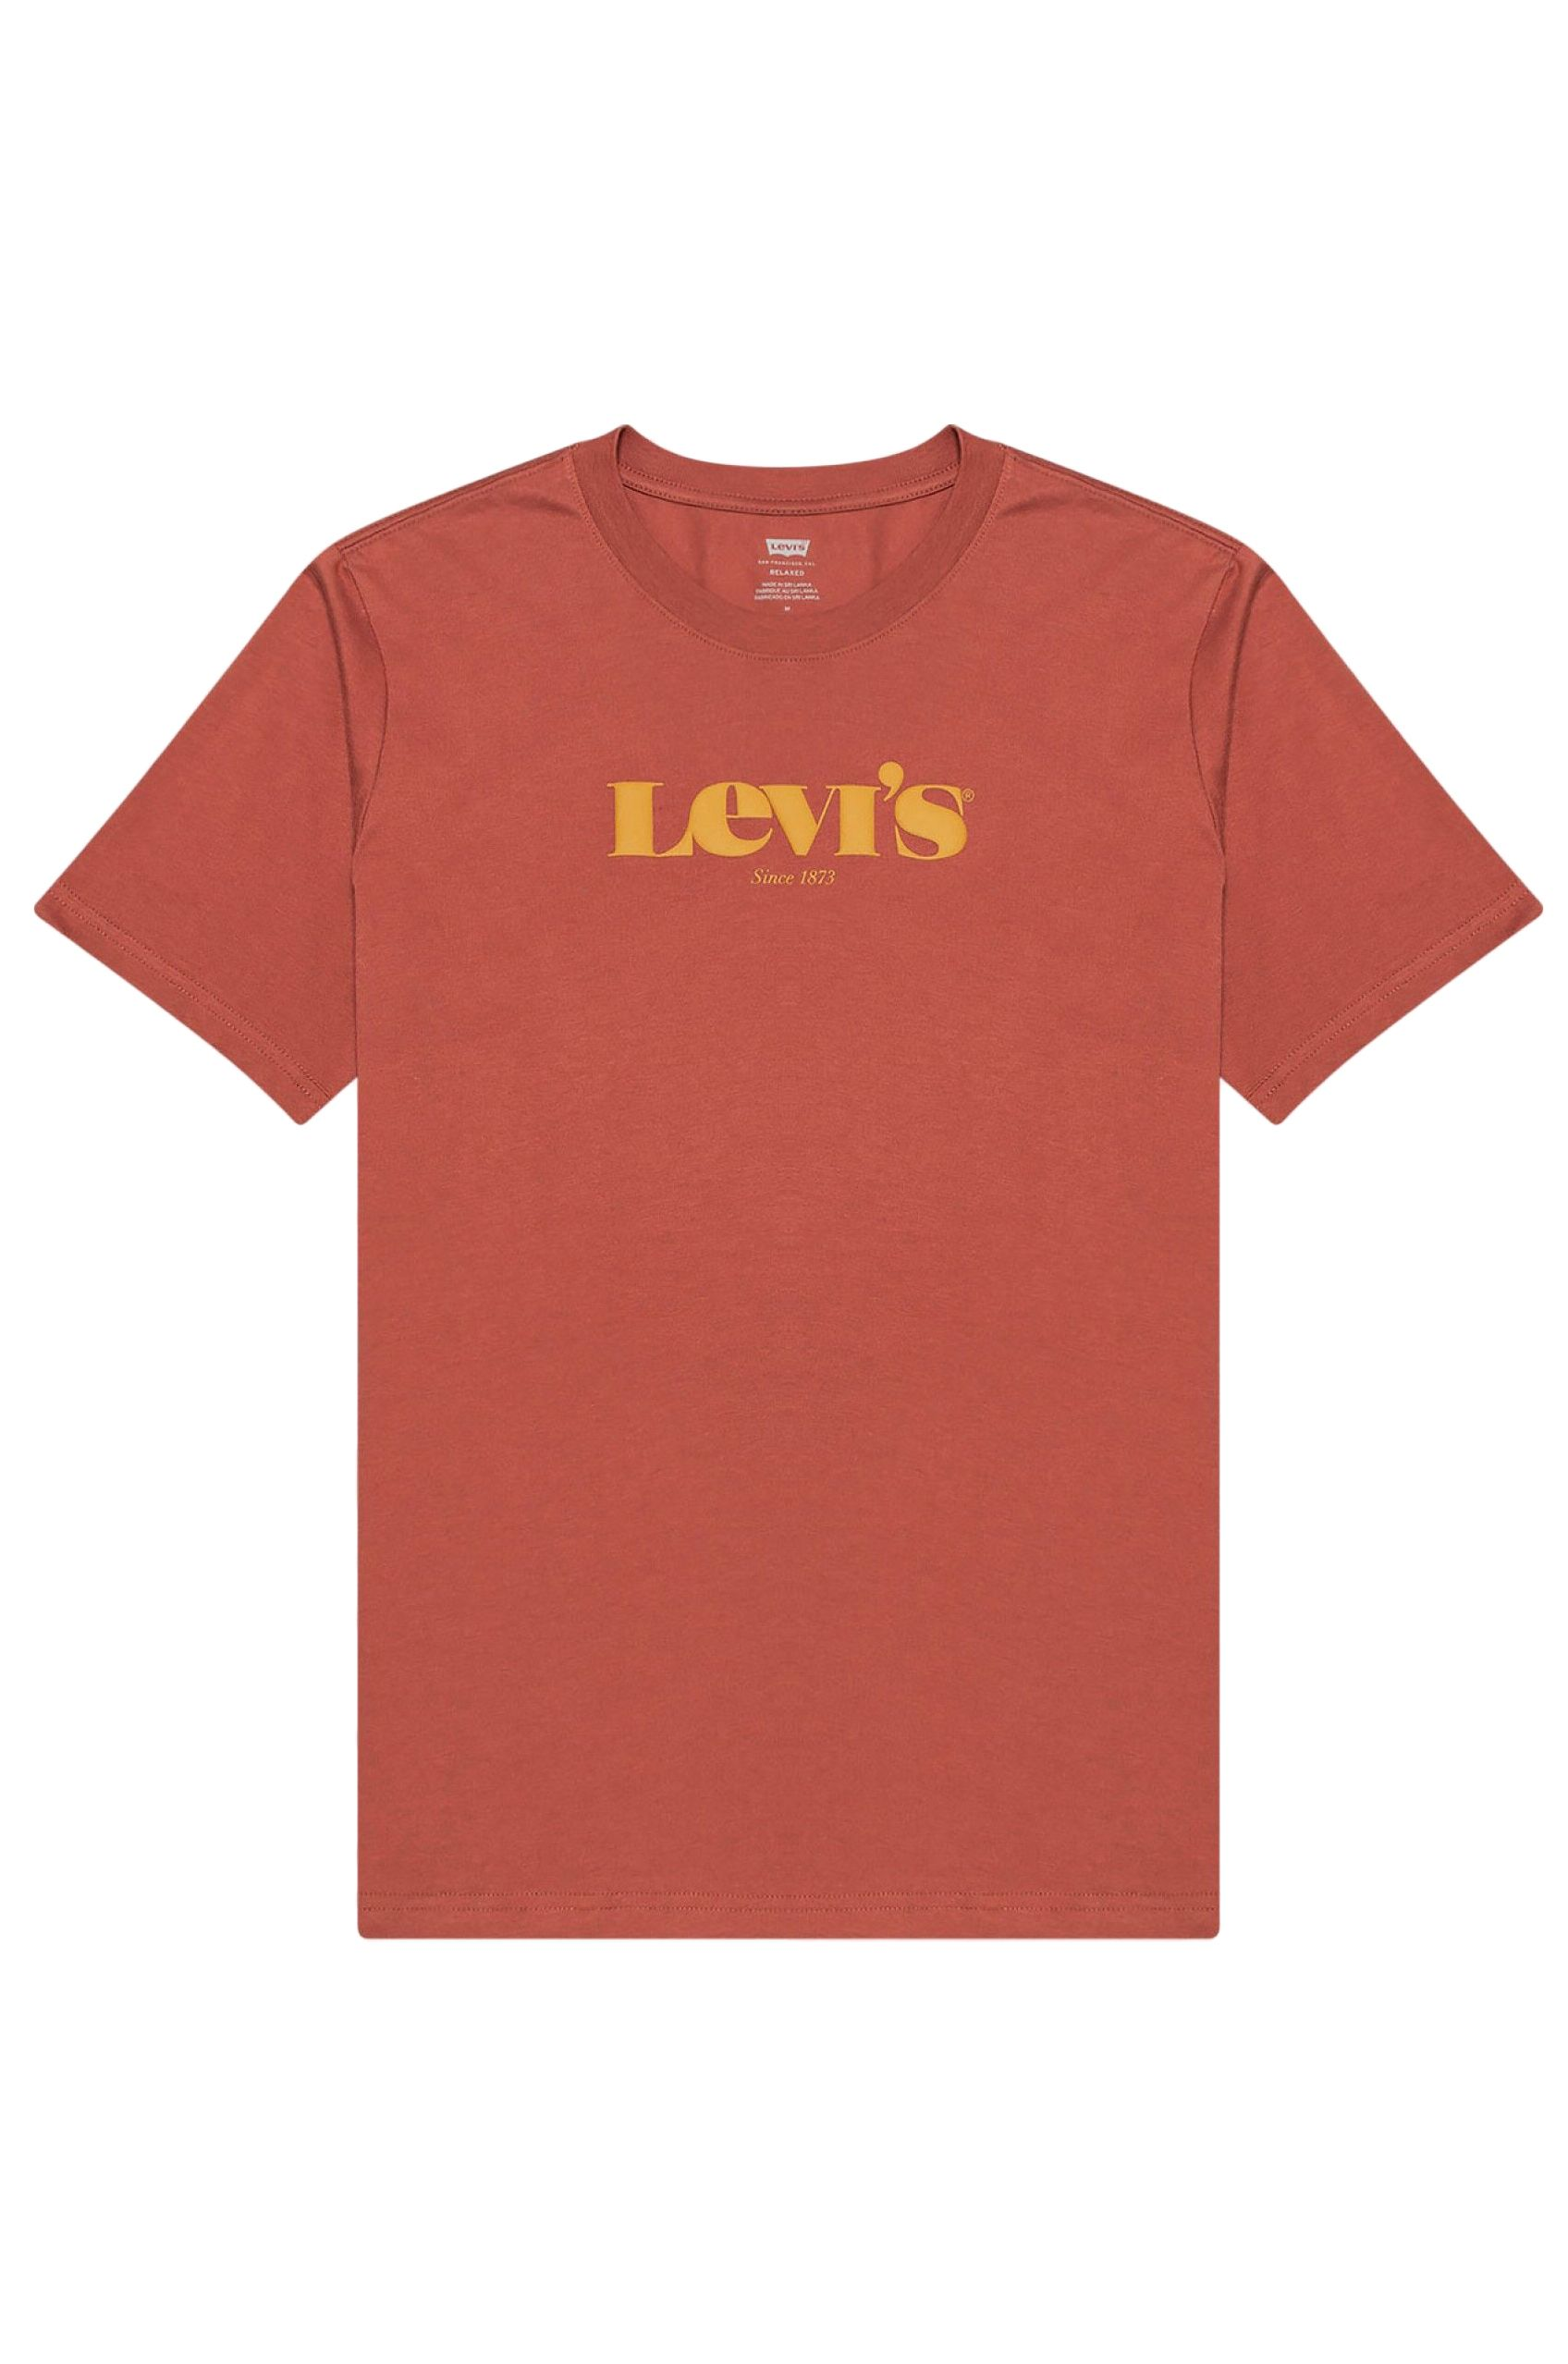 T-Shirt Levis RELAXED FIT Mv Ssnl Core Marsala